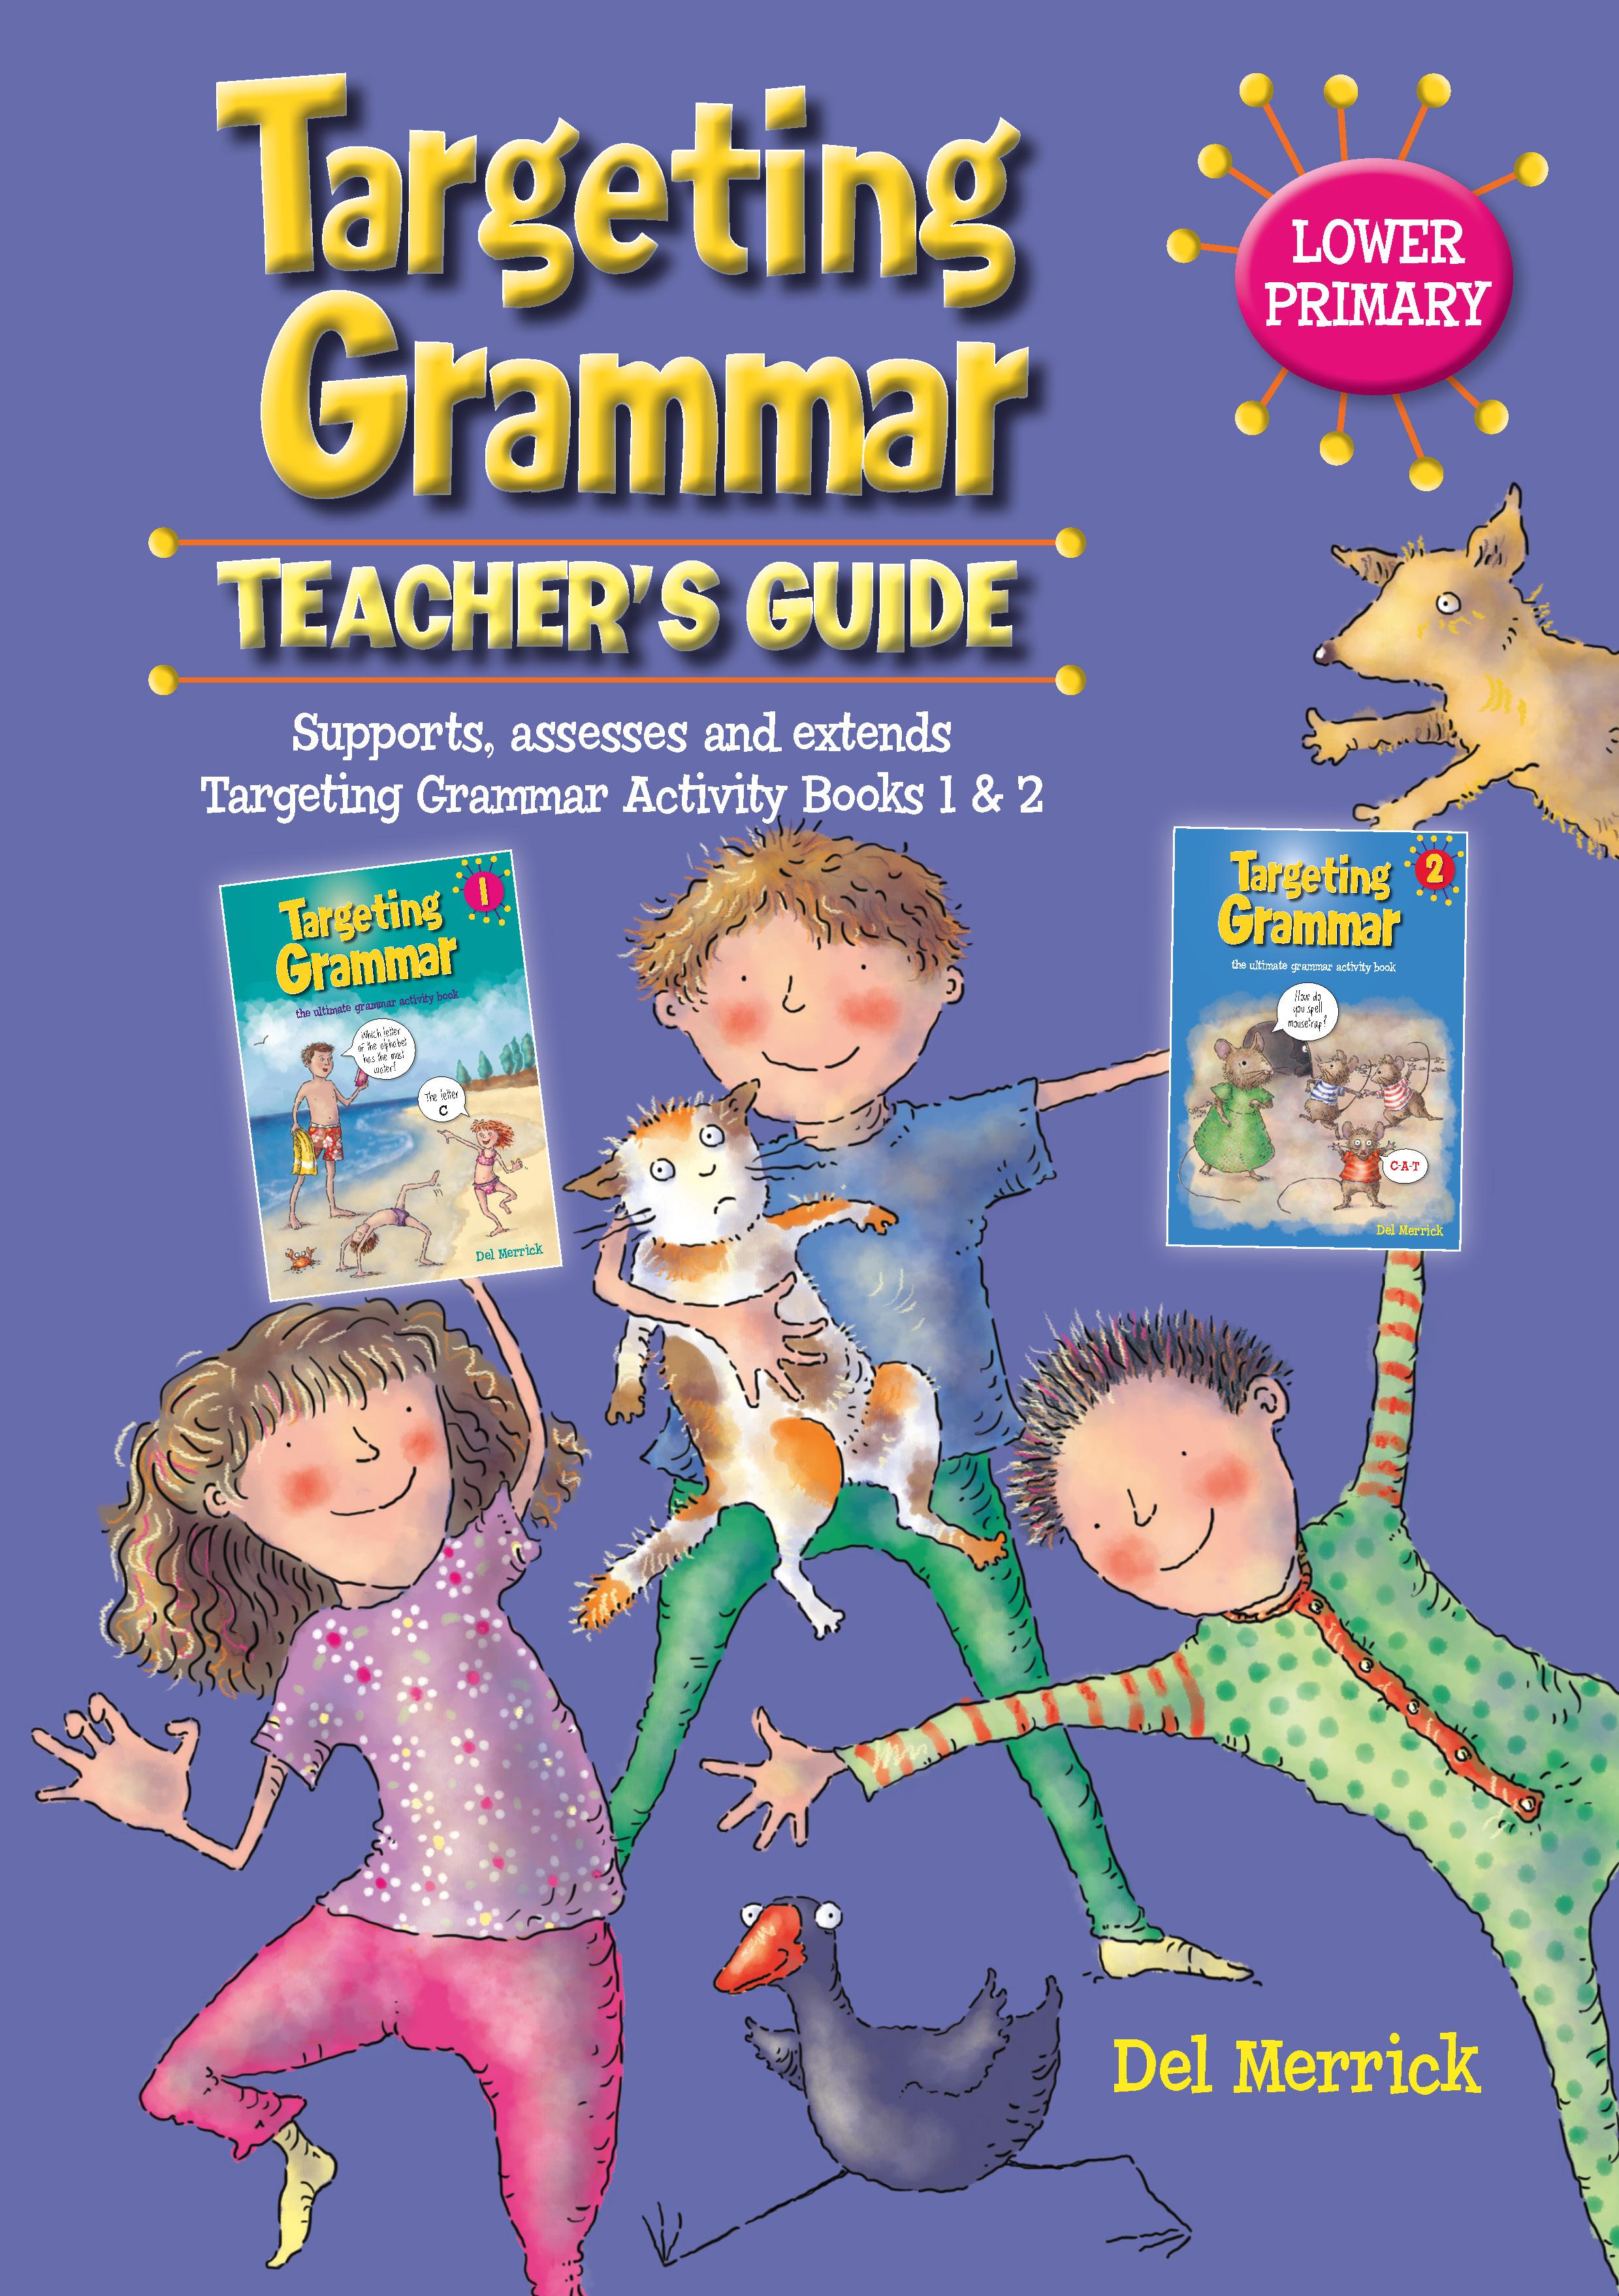 Targeting Grammar Teacher's Guide Lower Primary